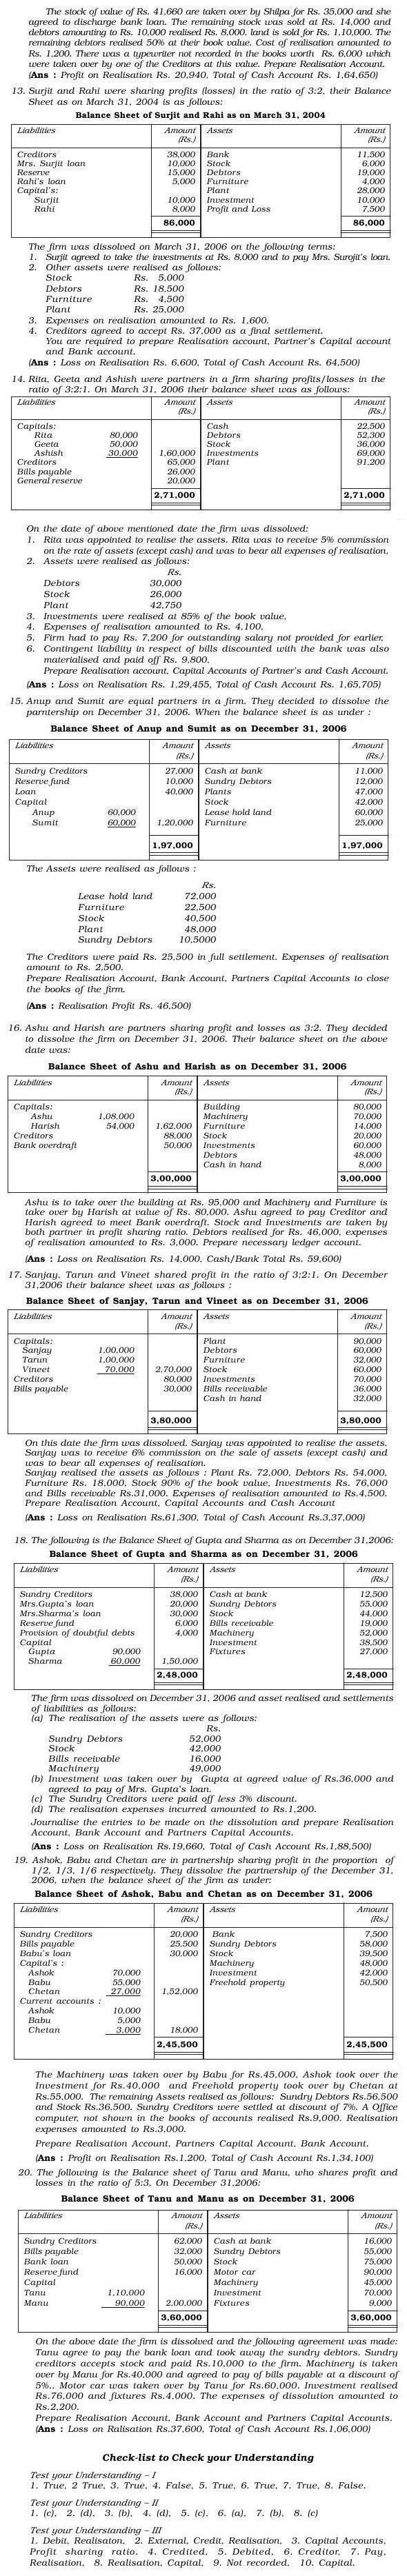 NCERT Class XII Accountancy I Chapter 5 - Dissolution of Partnership Firm